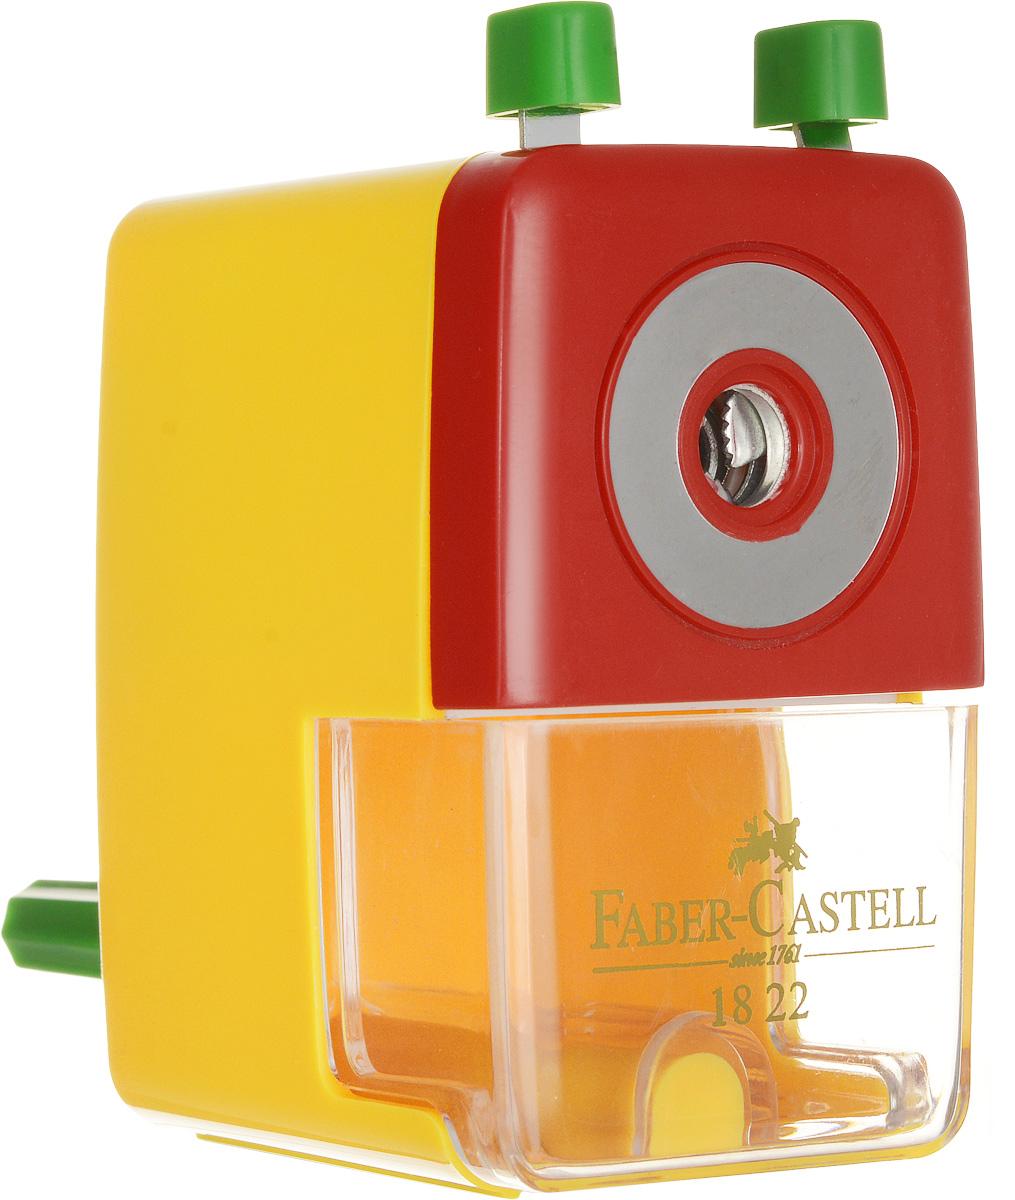 Faber-Castell Точилка настольная цвет желтый